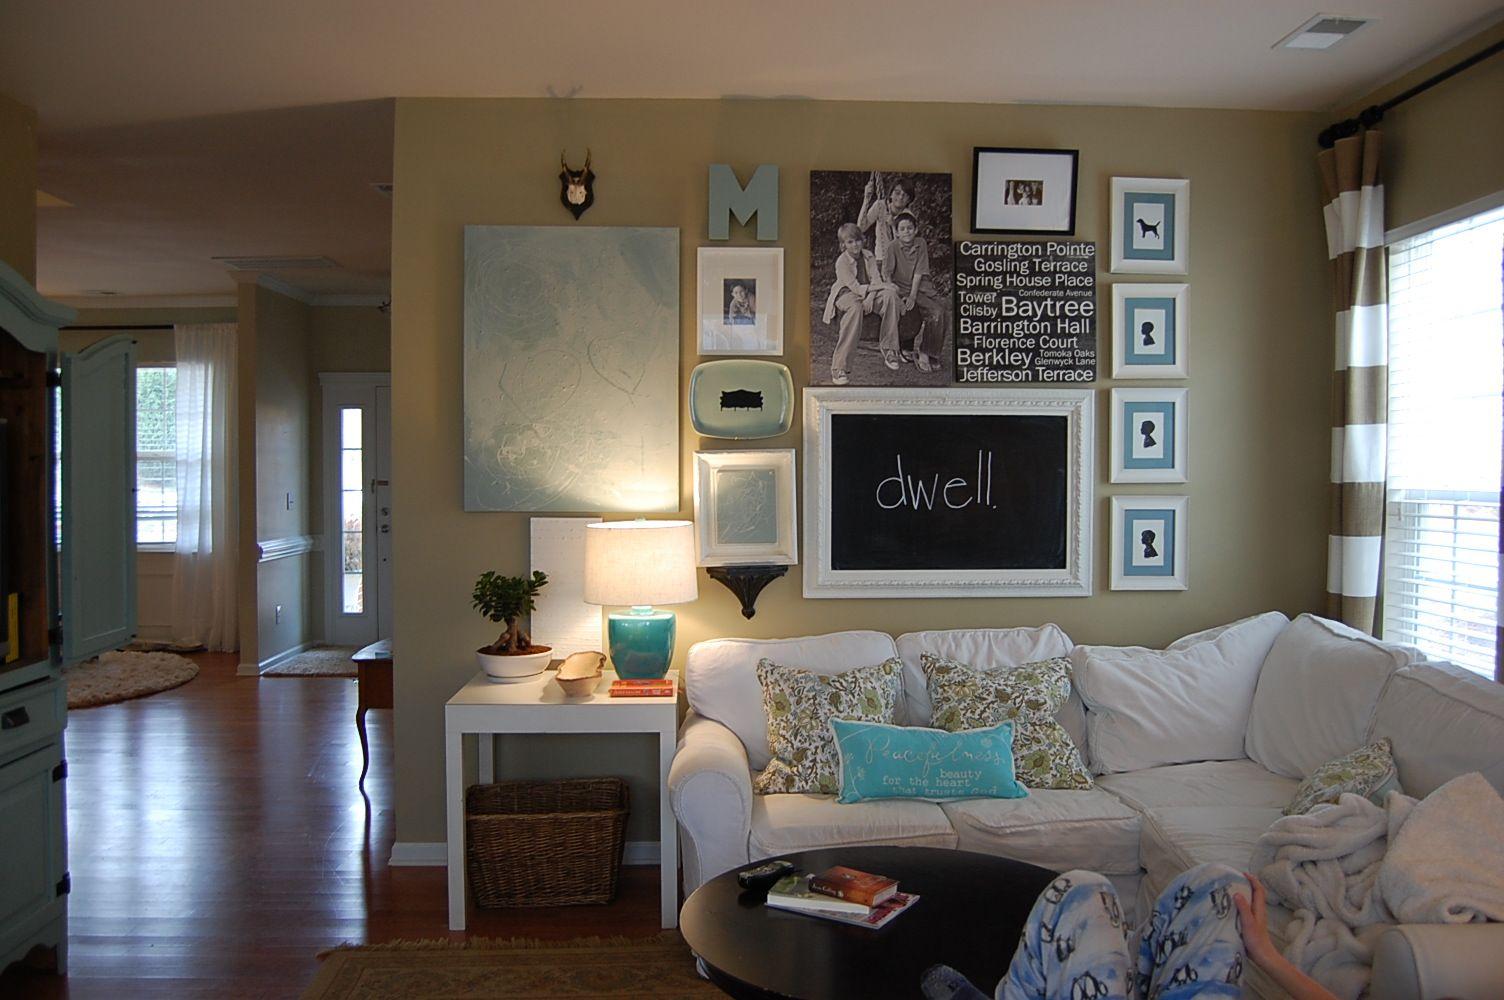 Perfect Comfortable Family Home Decor. Paint Color: Favorite Tan